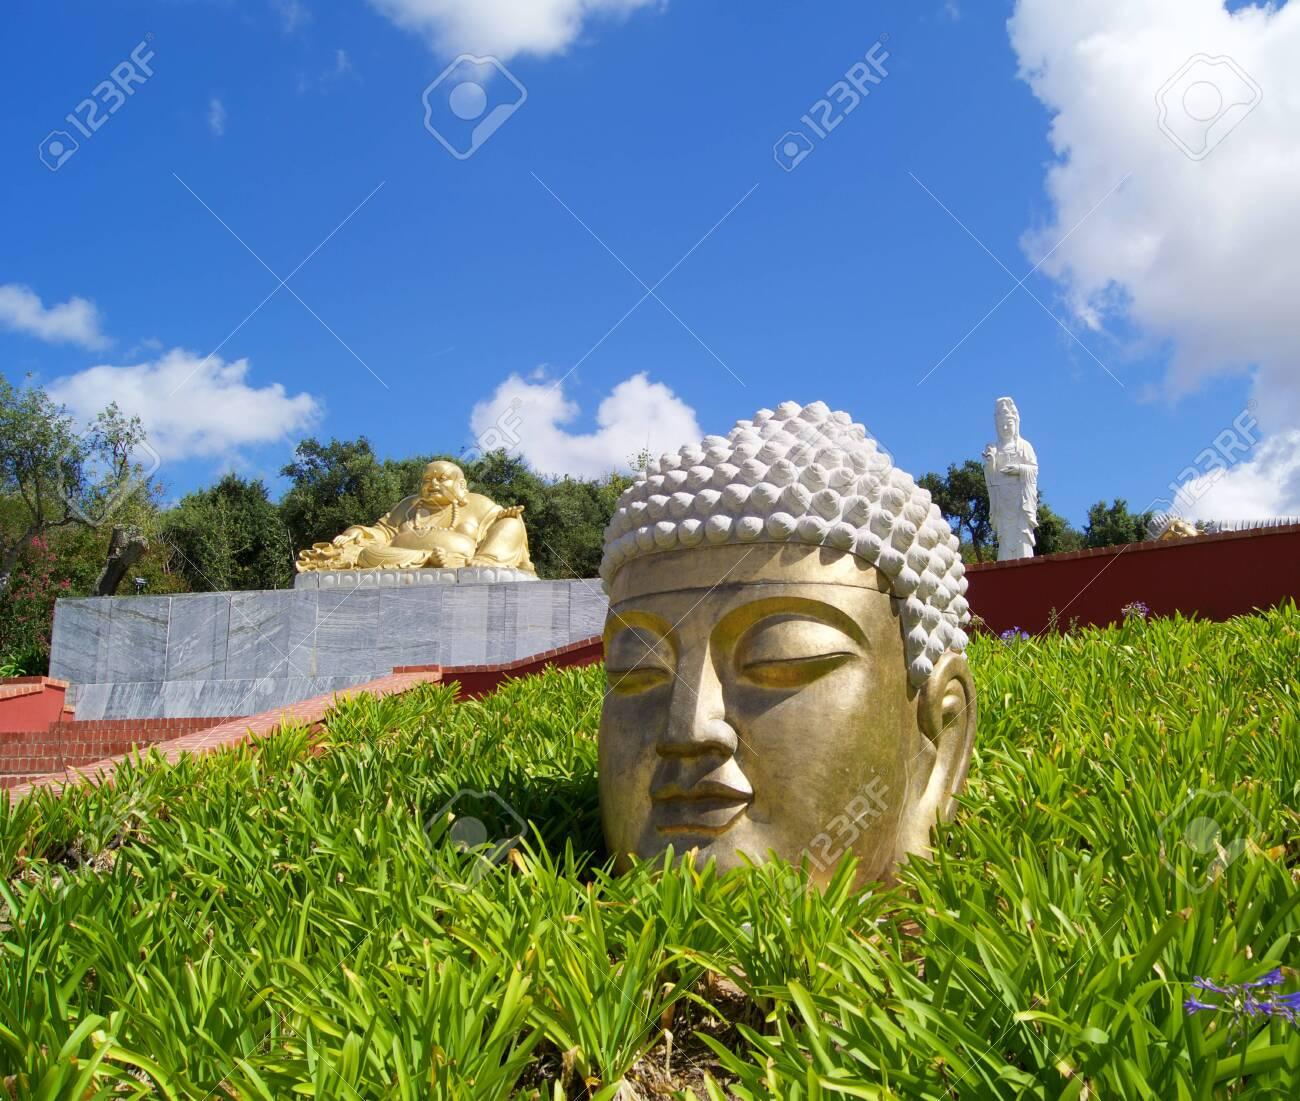 Green Terracotta Standing Buddha